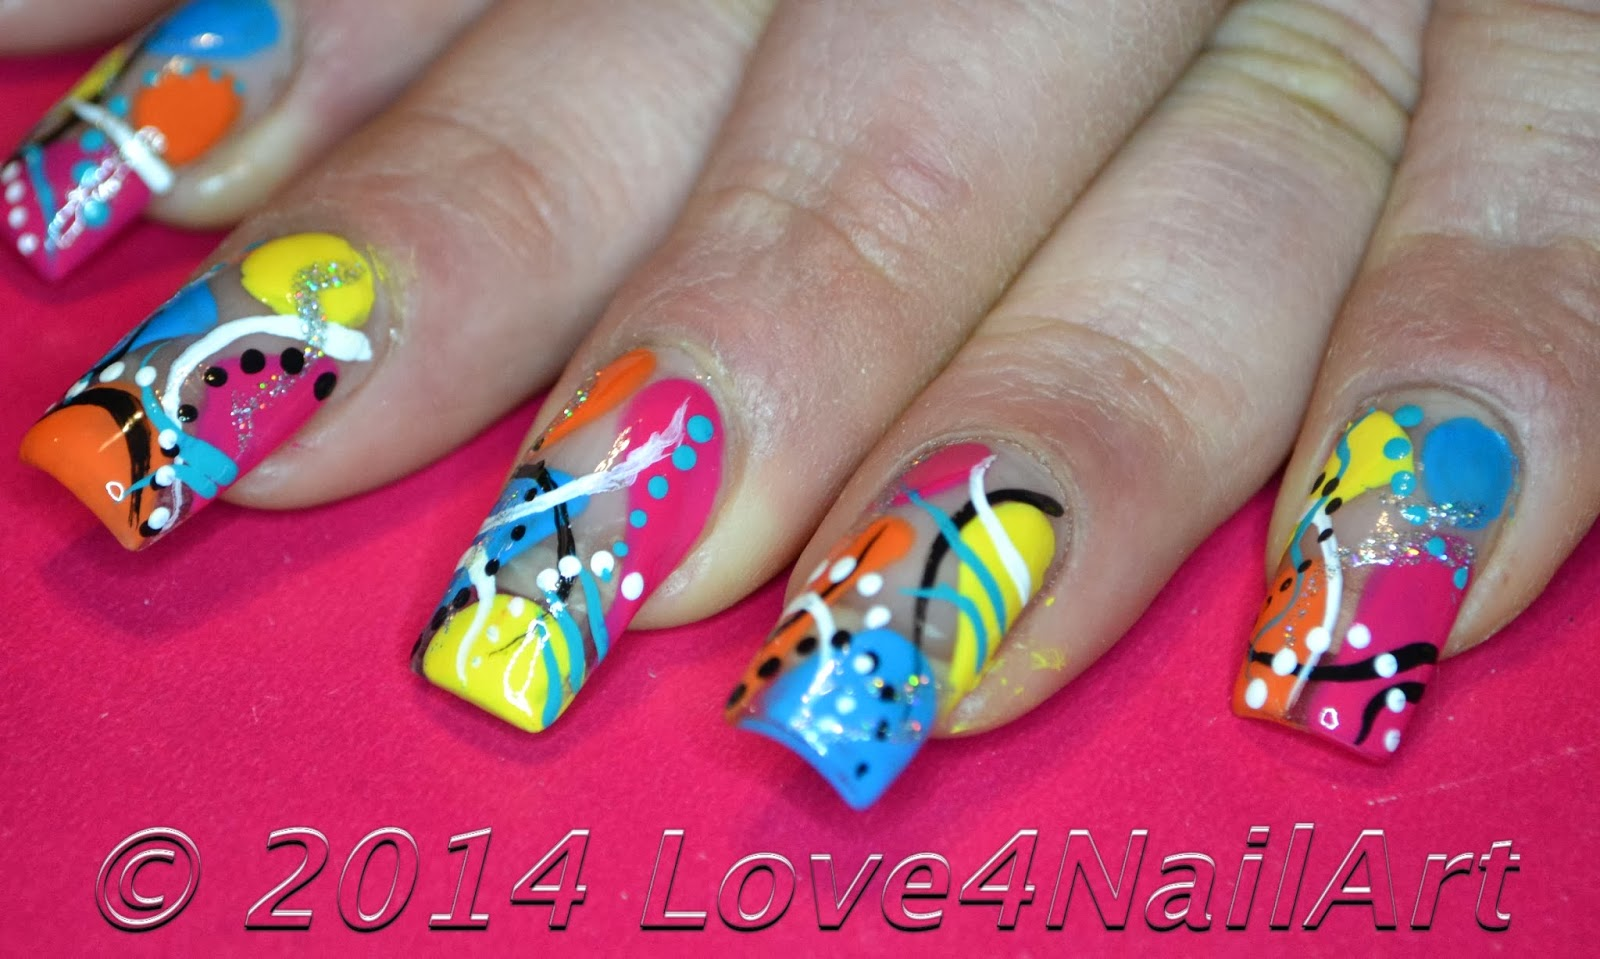 Love4nailart Super Fun And Colorful Abract Nail Art Design Idea